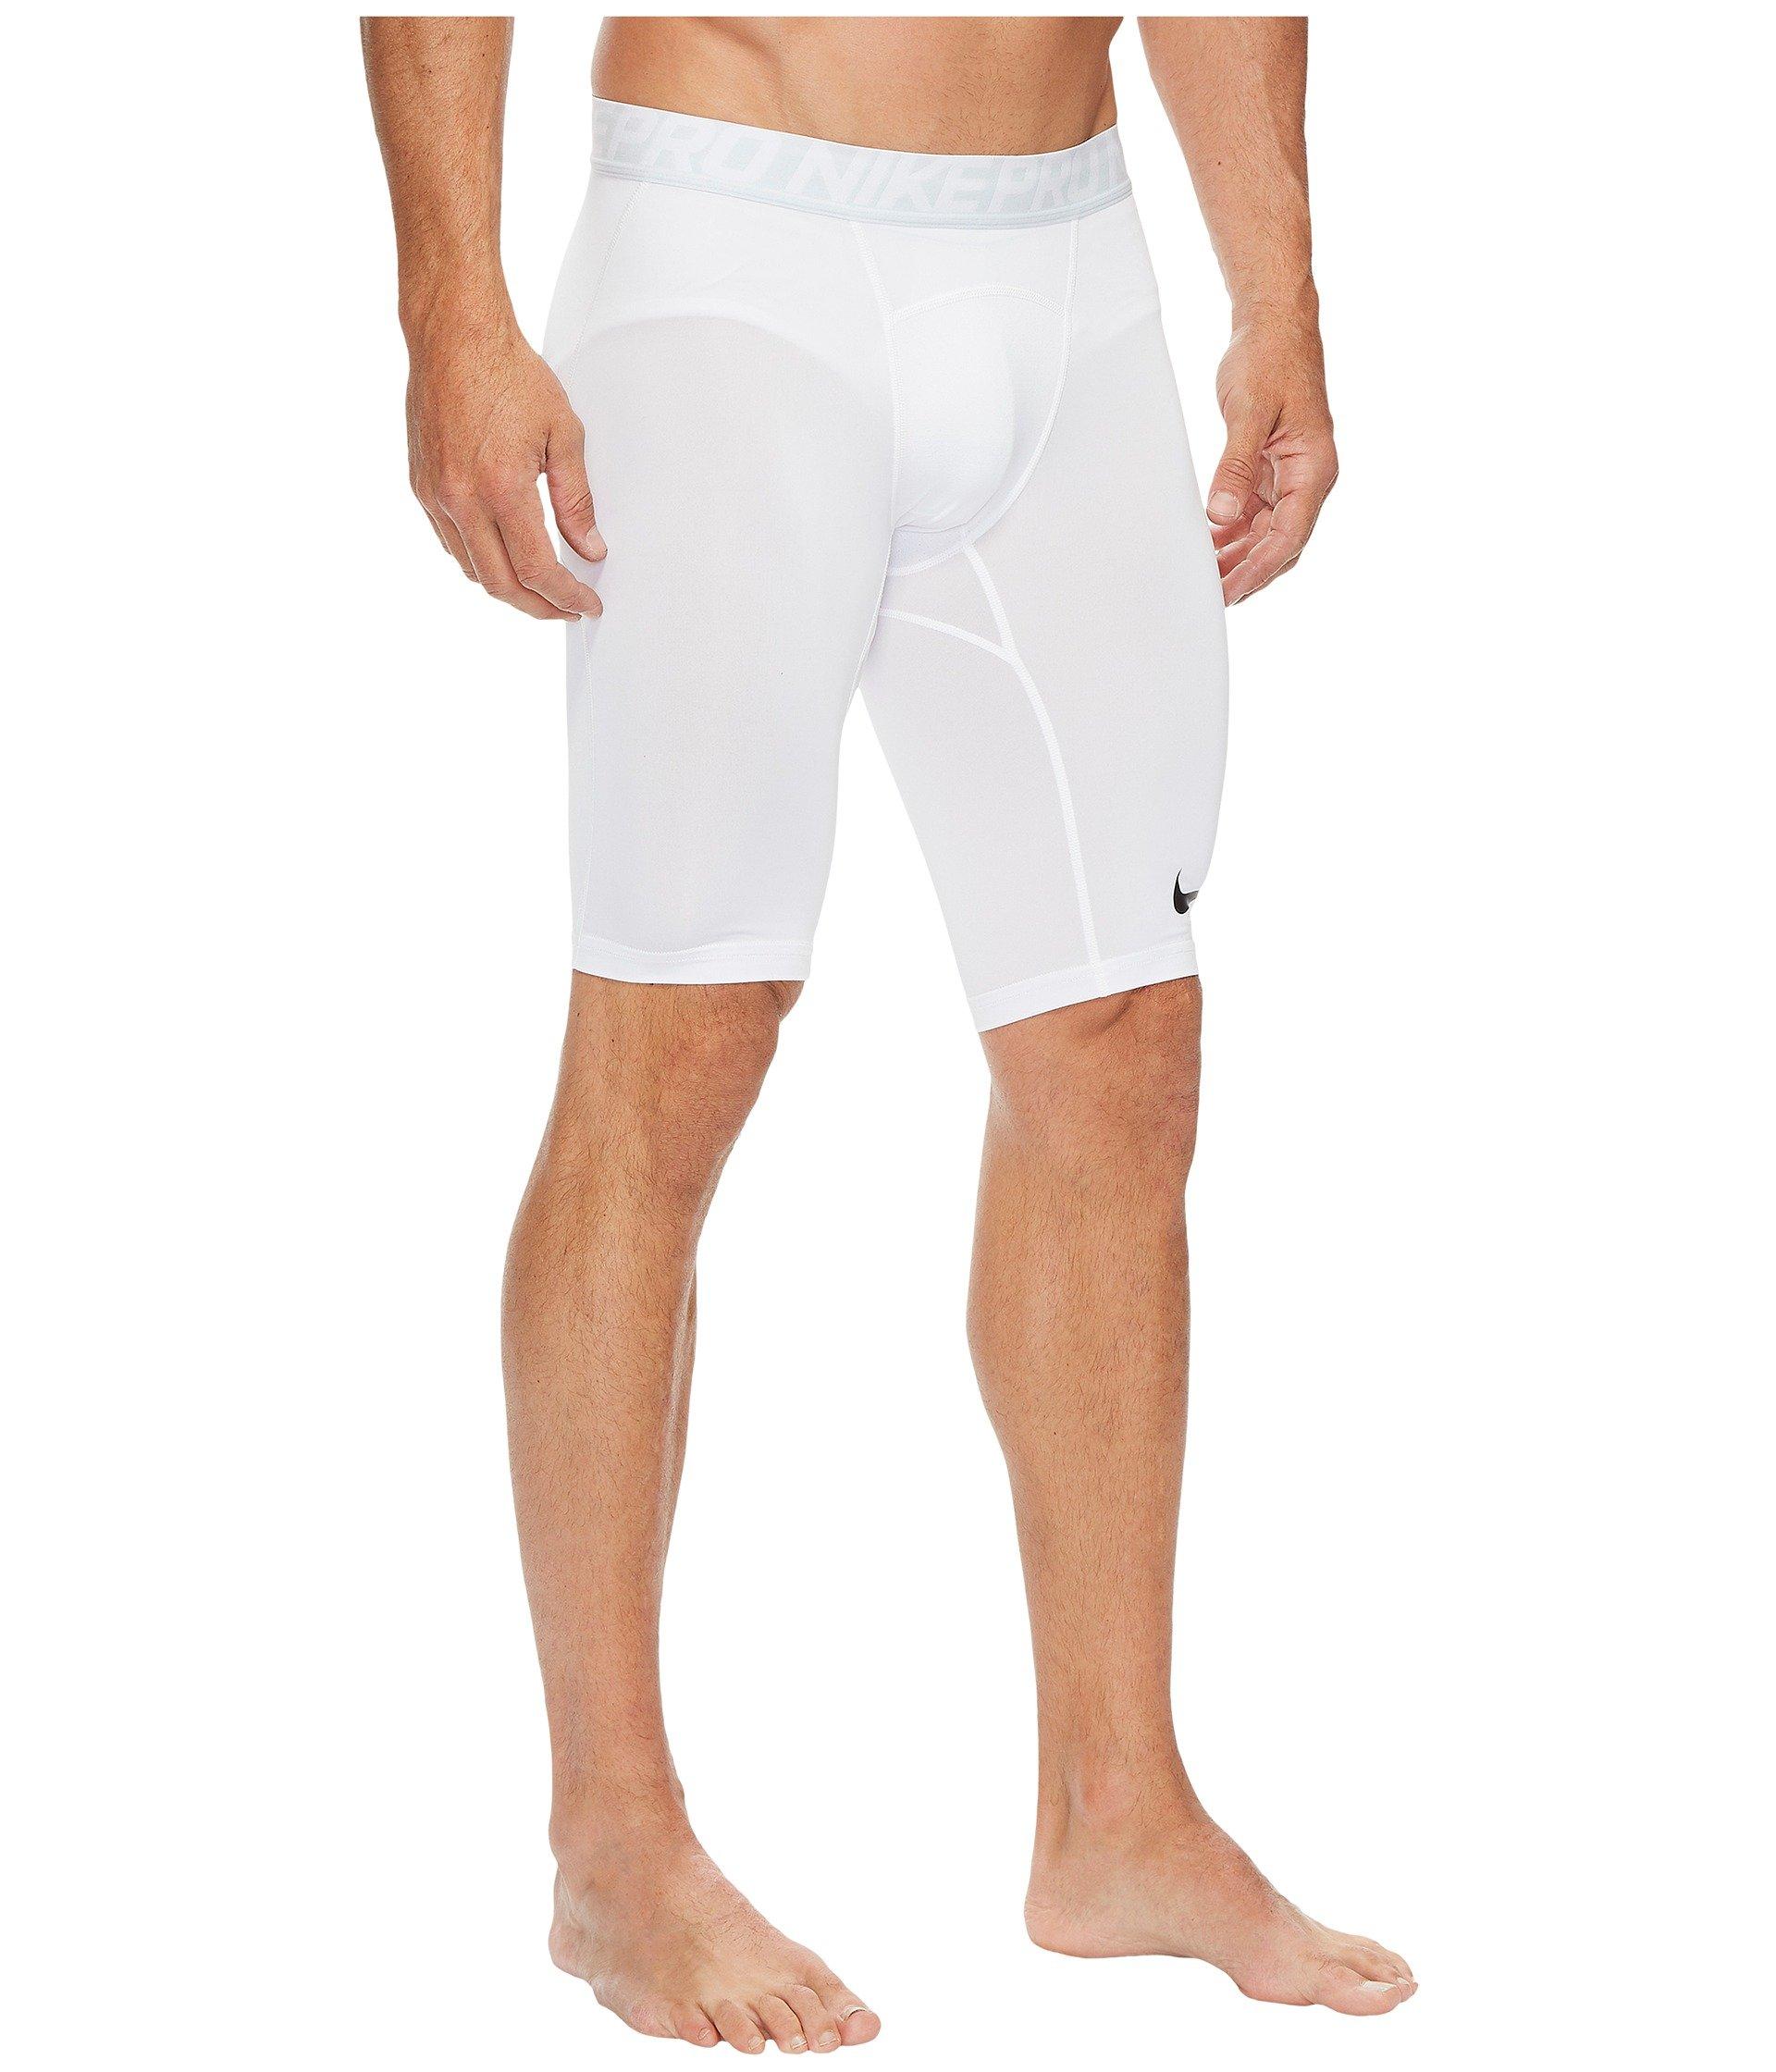 Nike Men's Pro Training Shorts, White/Pure Platinum/Black, Small by Nike (Image #5)